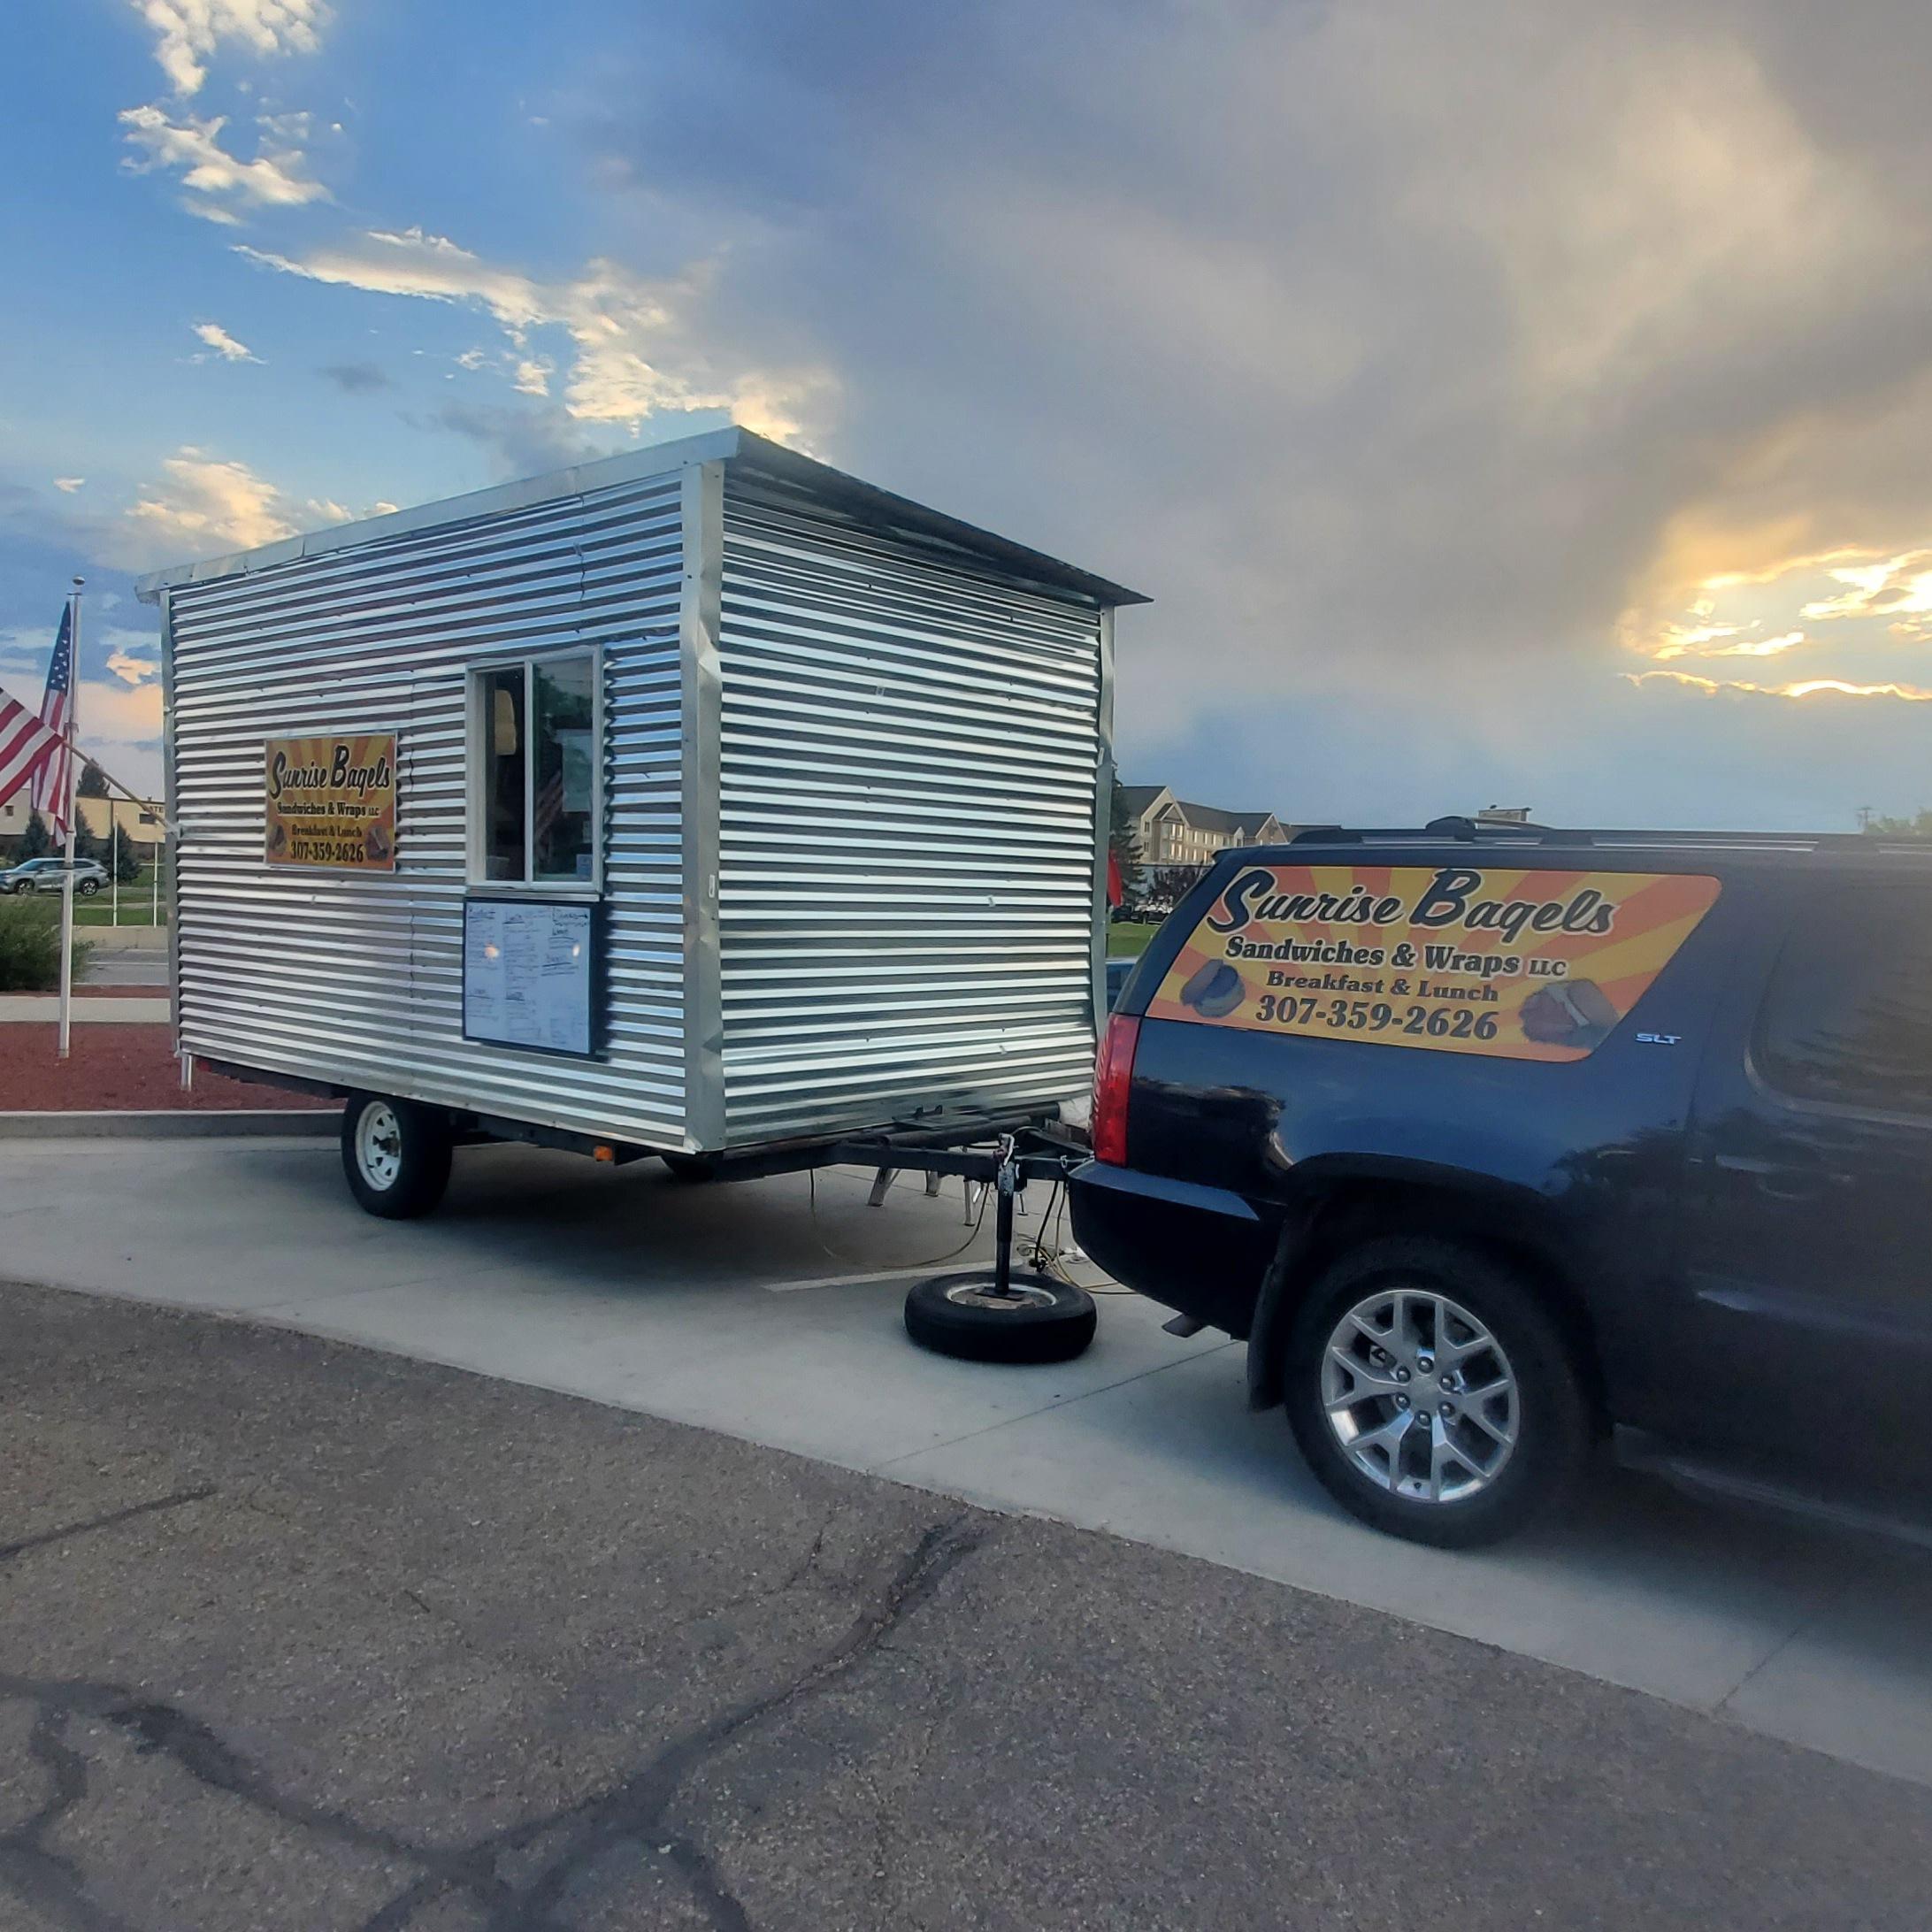 Sunrise Bagel Sandwiches food truck profile image